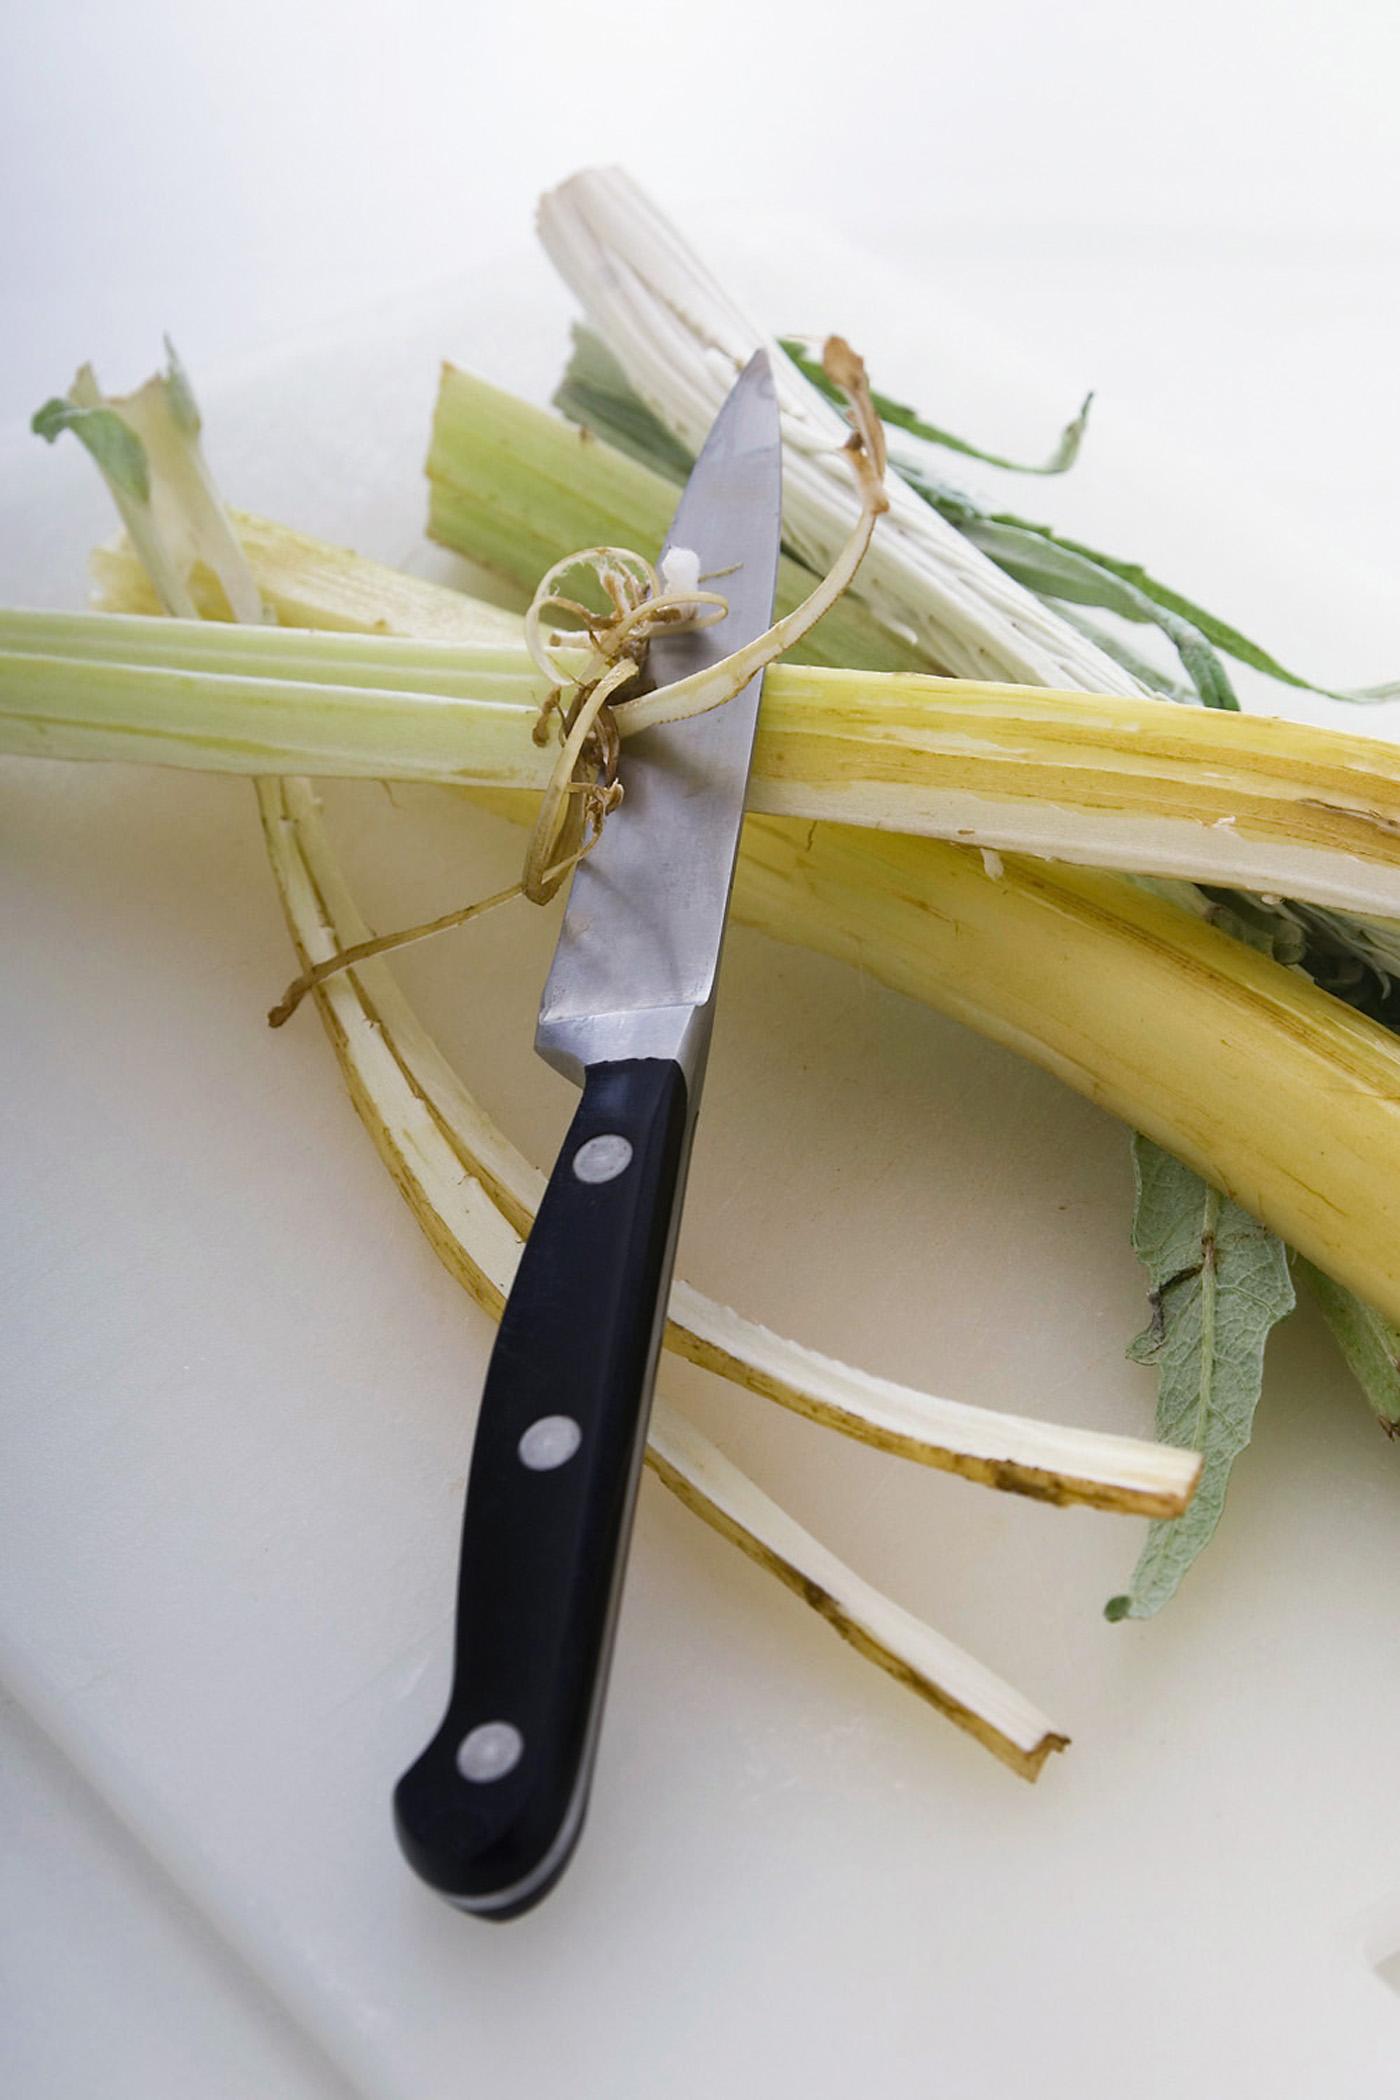 Come cucinare i cardi sale pepe - Cucinare i cardi ...